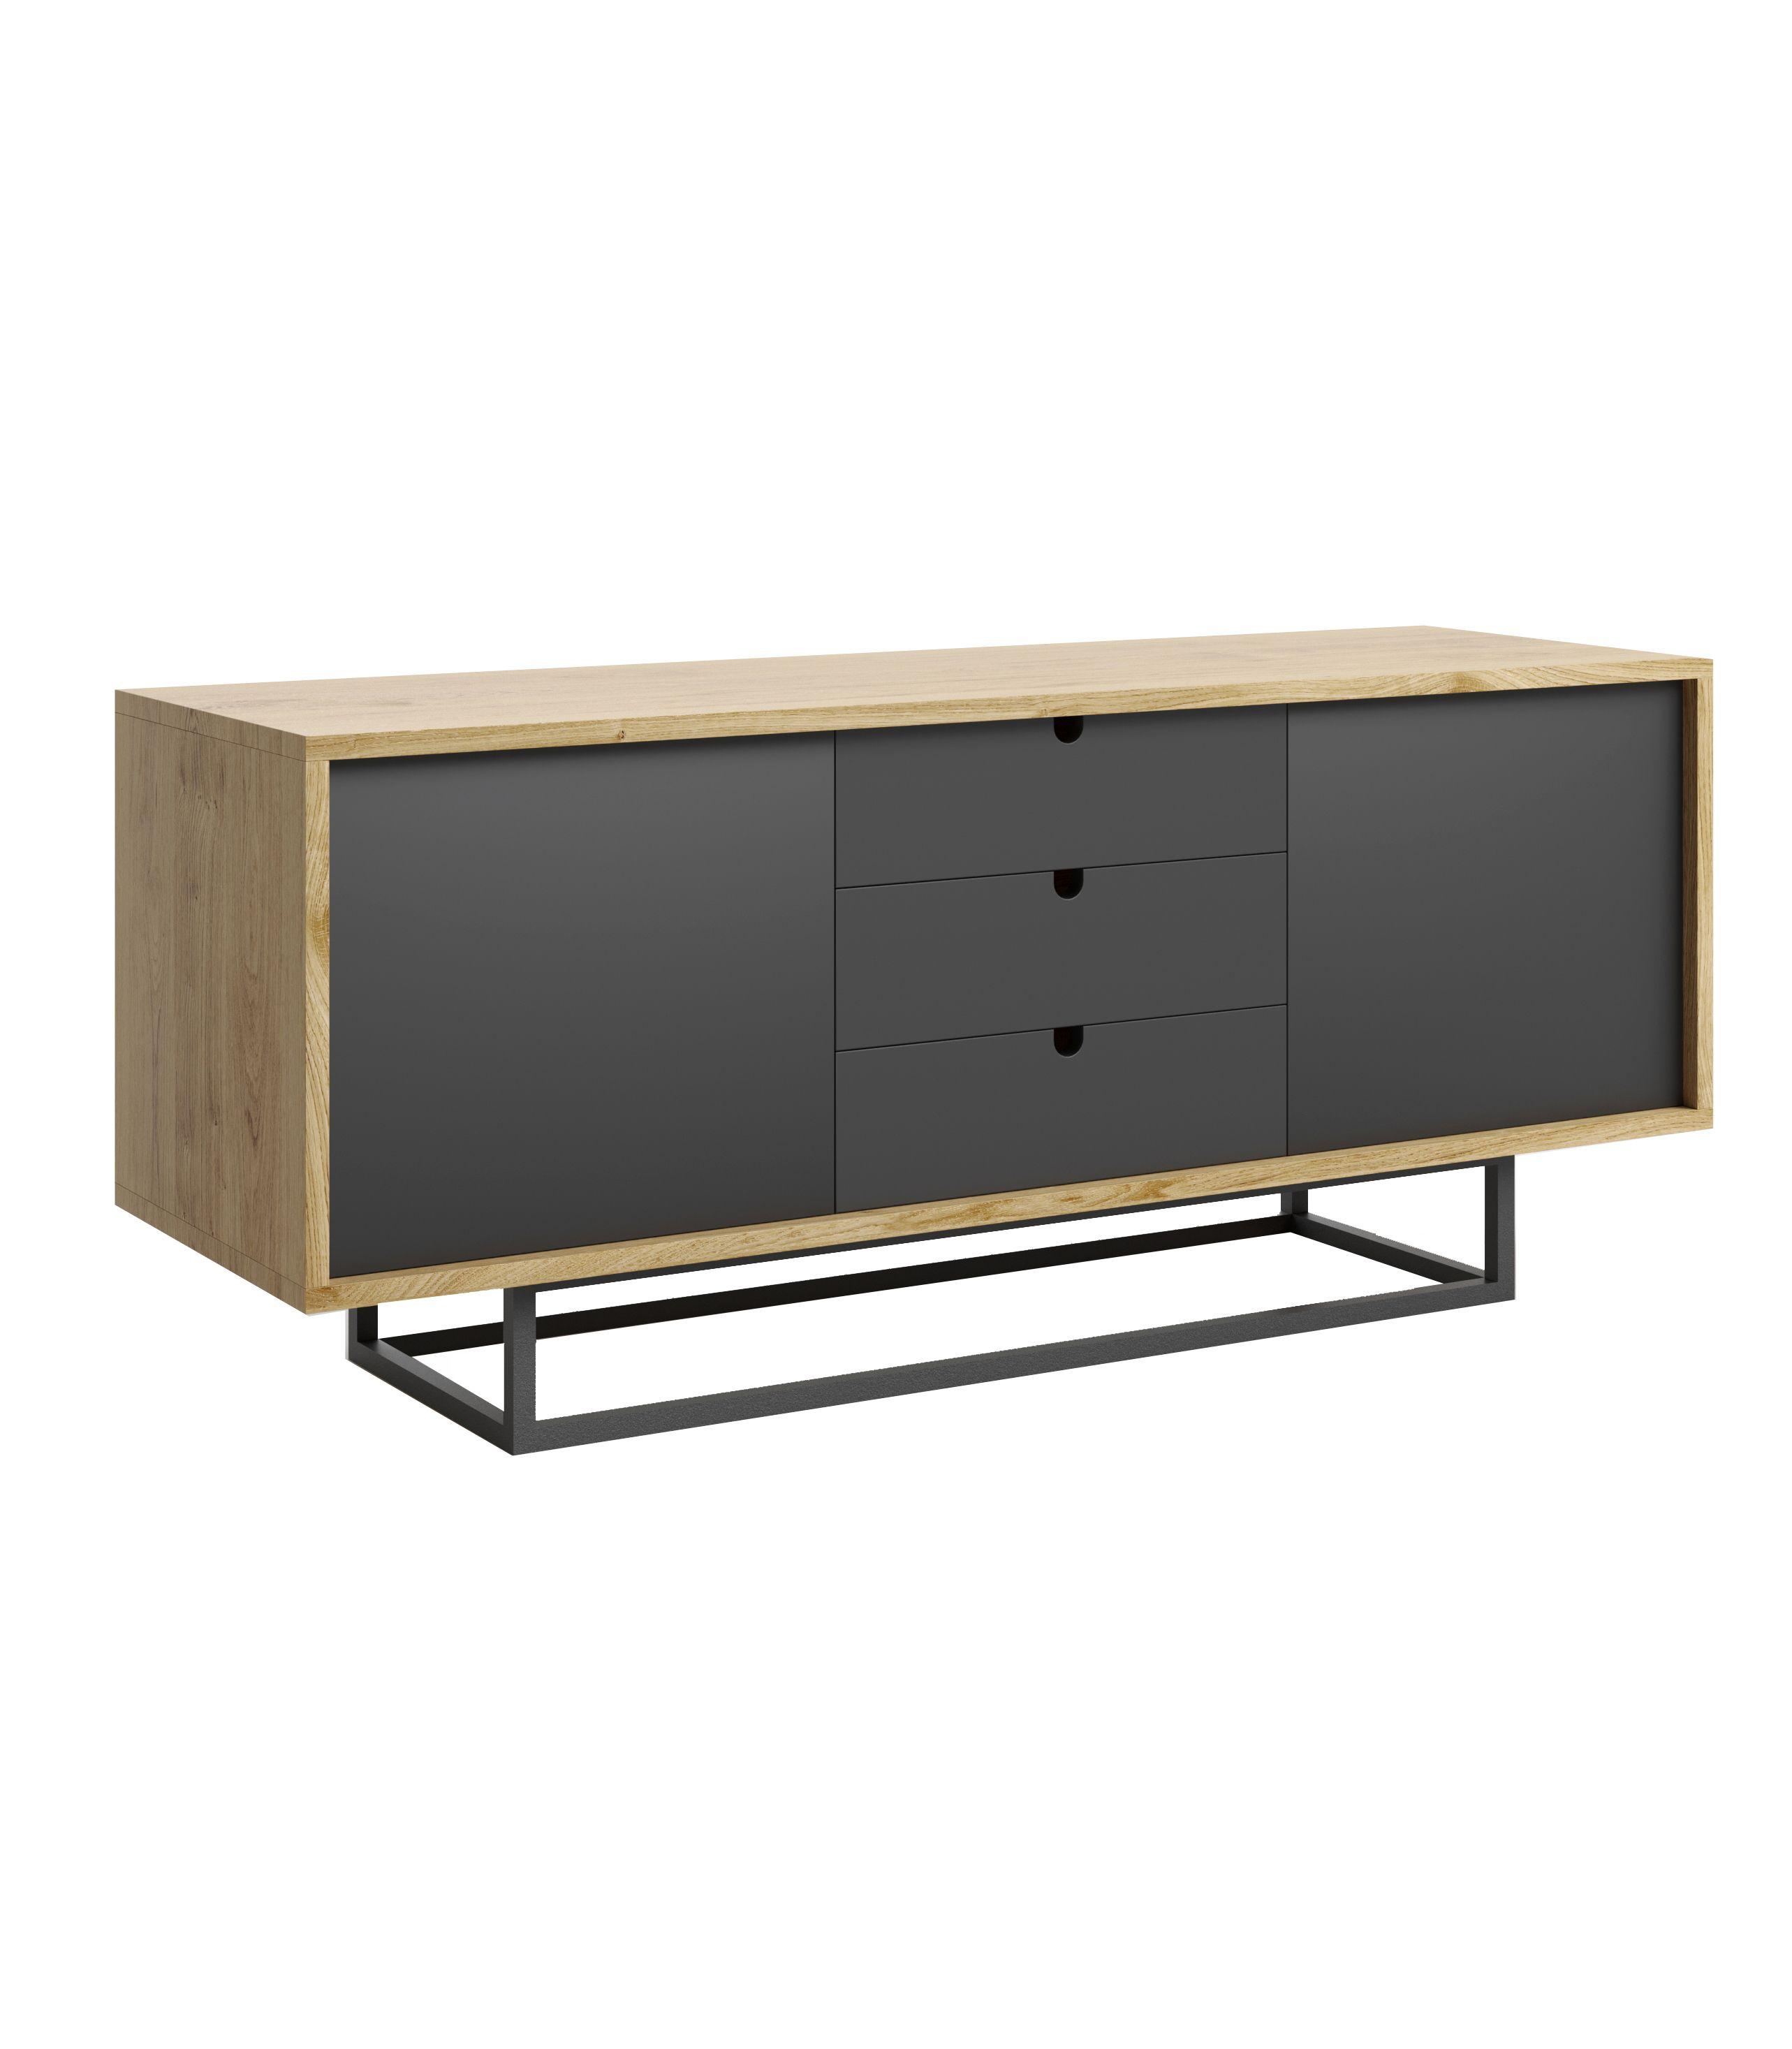 szafka do salonu nowoczesna czarna